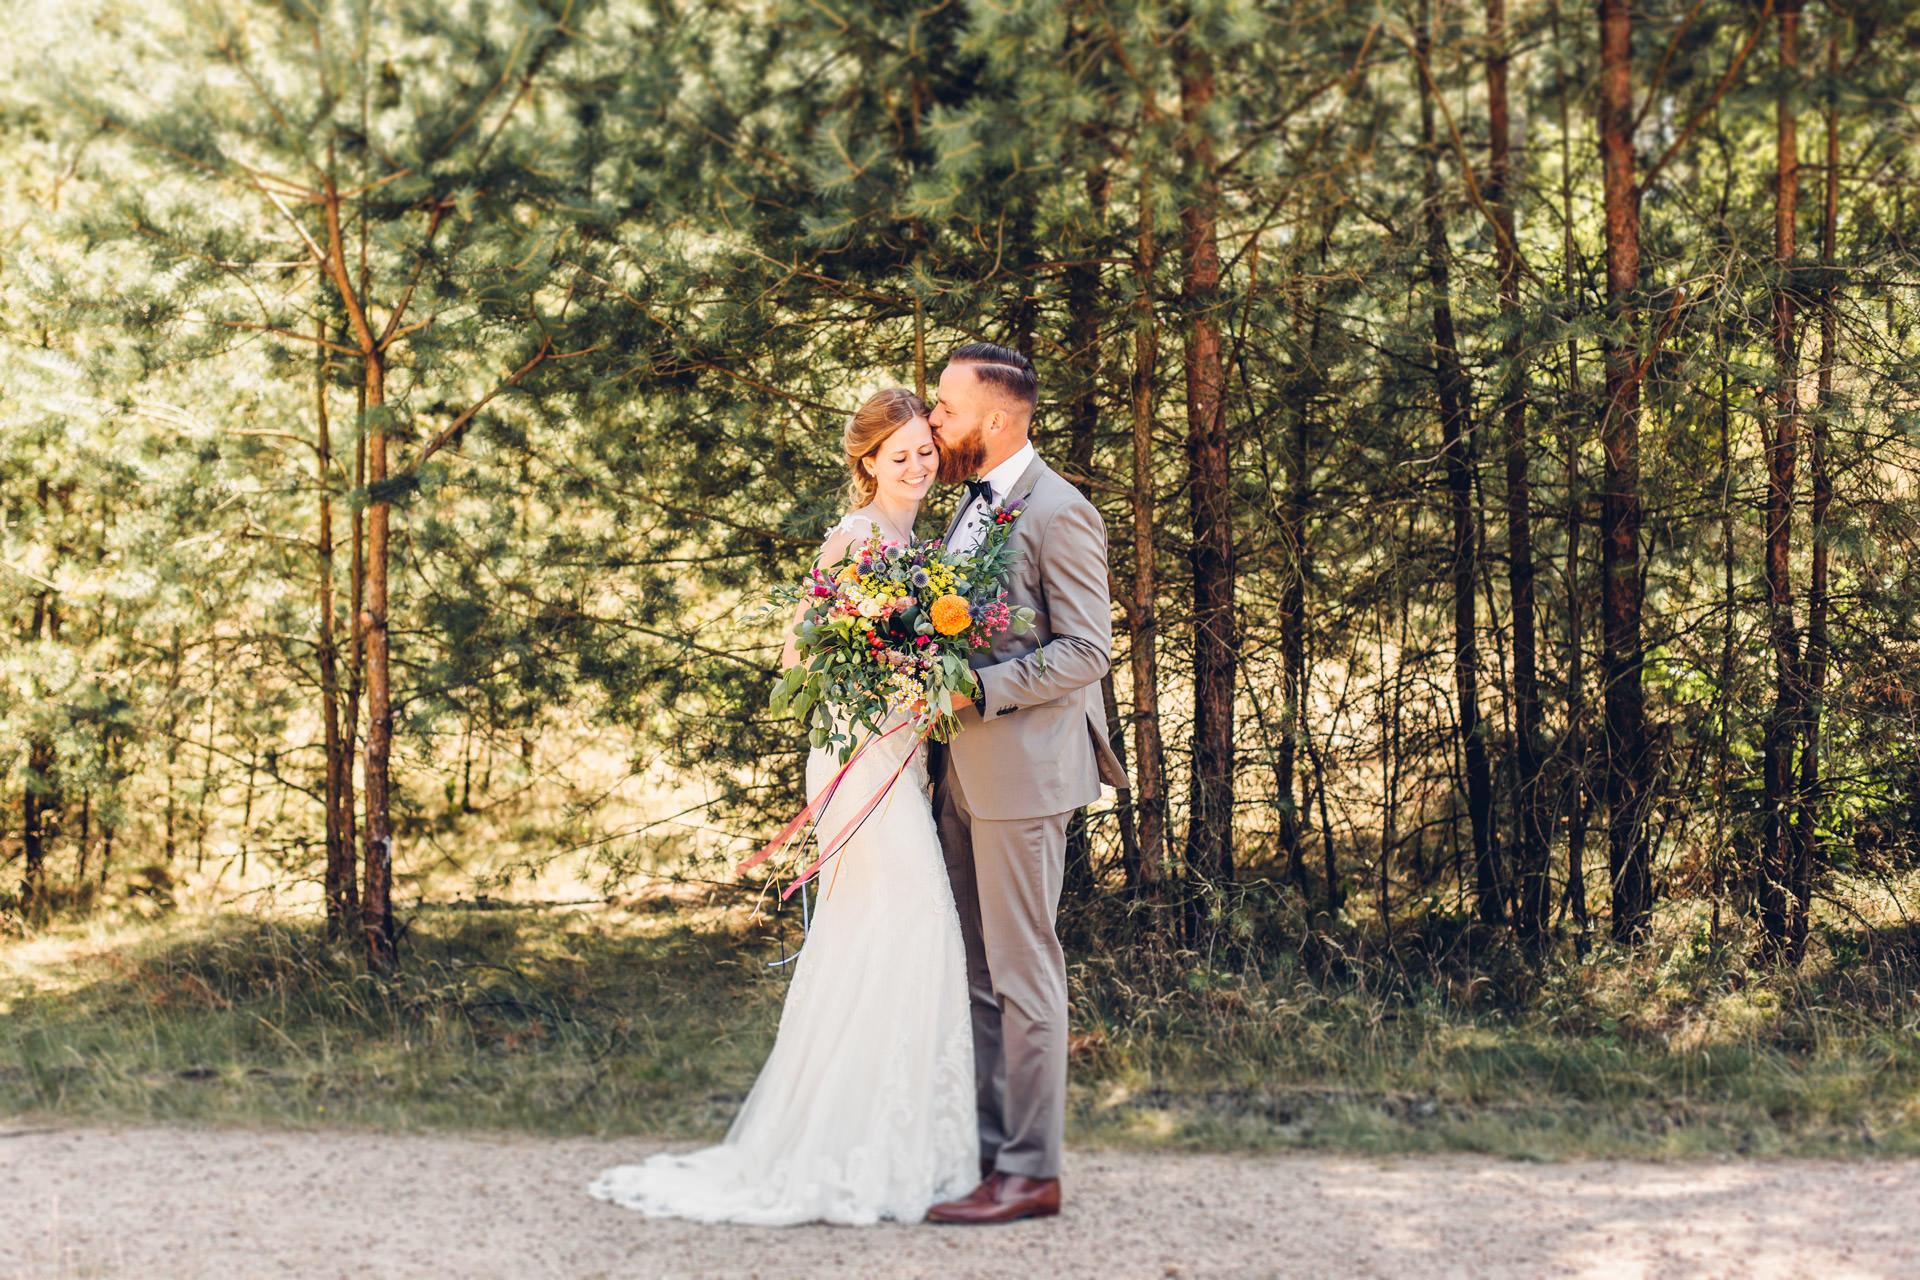 Hochzeitsfotograf Mainz Freie Trauung